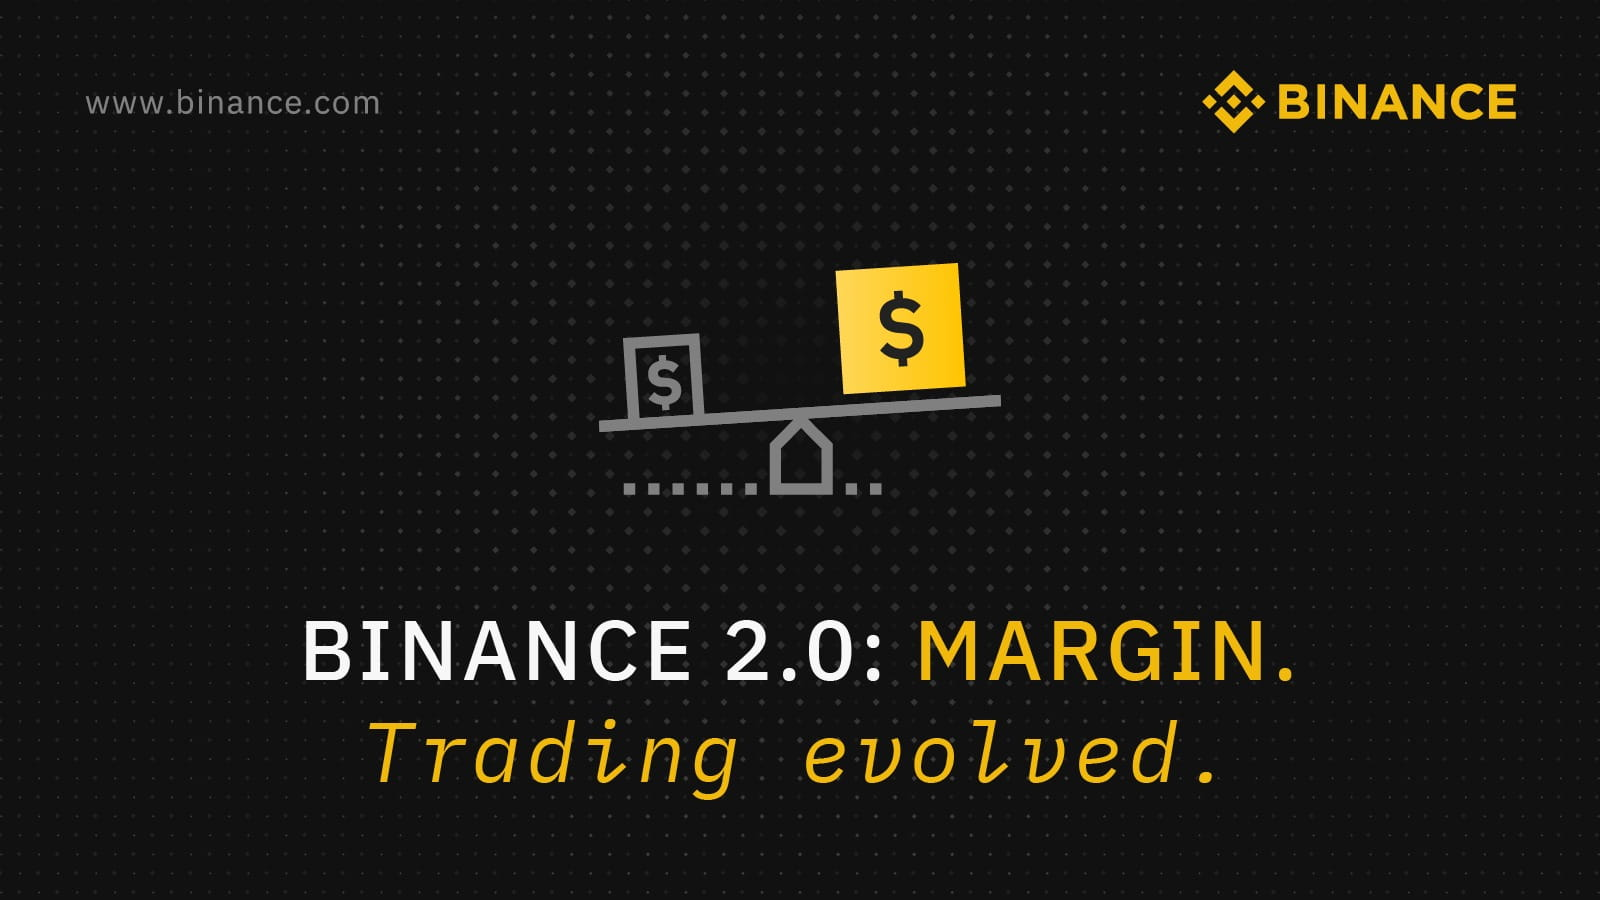 https://jp.boxhoidap.com/boxfiles/margin-trading-exchange-la-gi--0798f2a66eb1342206cdfda645b6c689.wepb